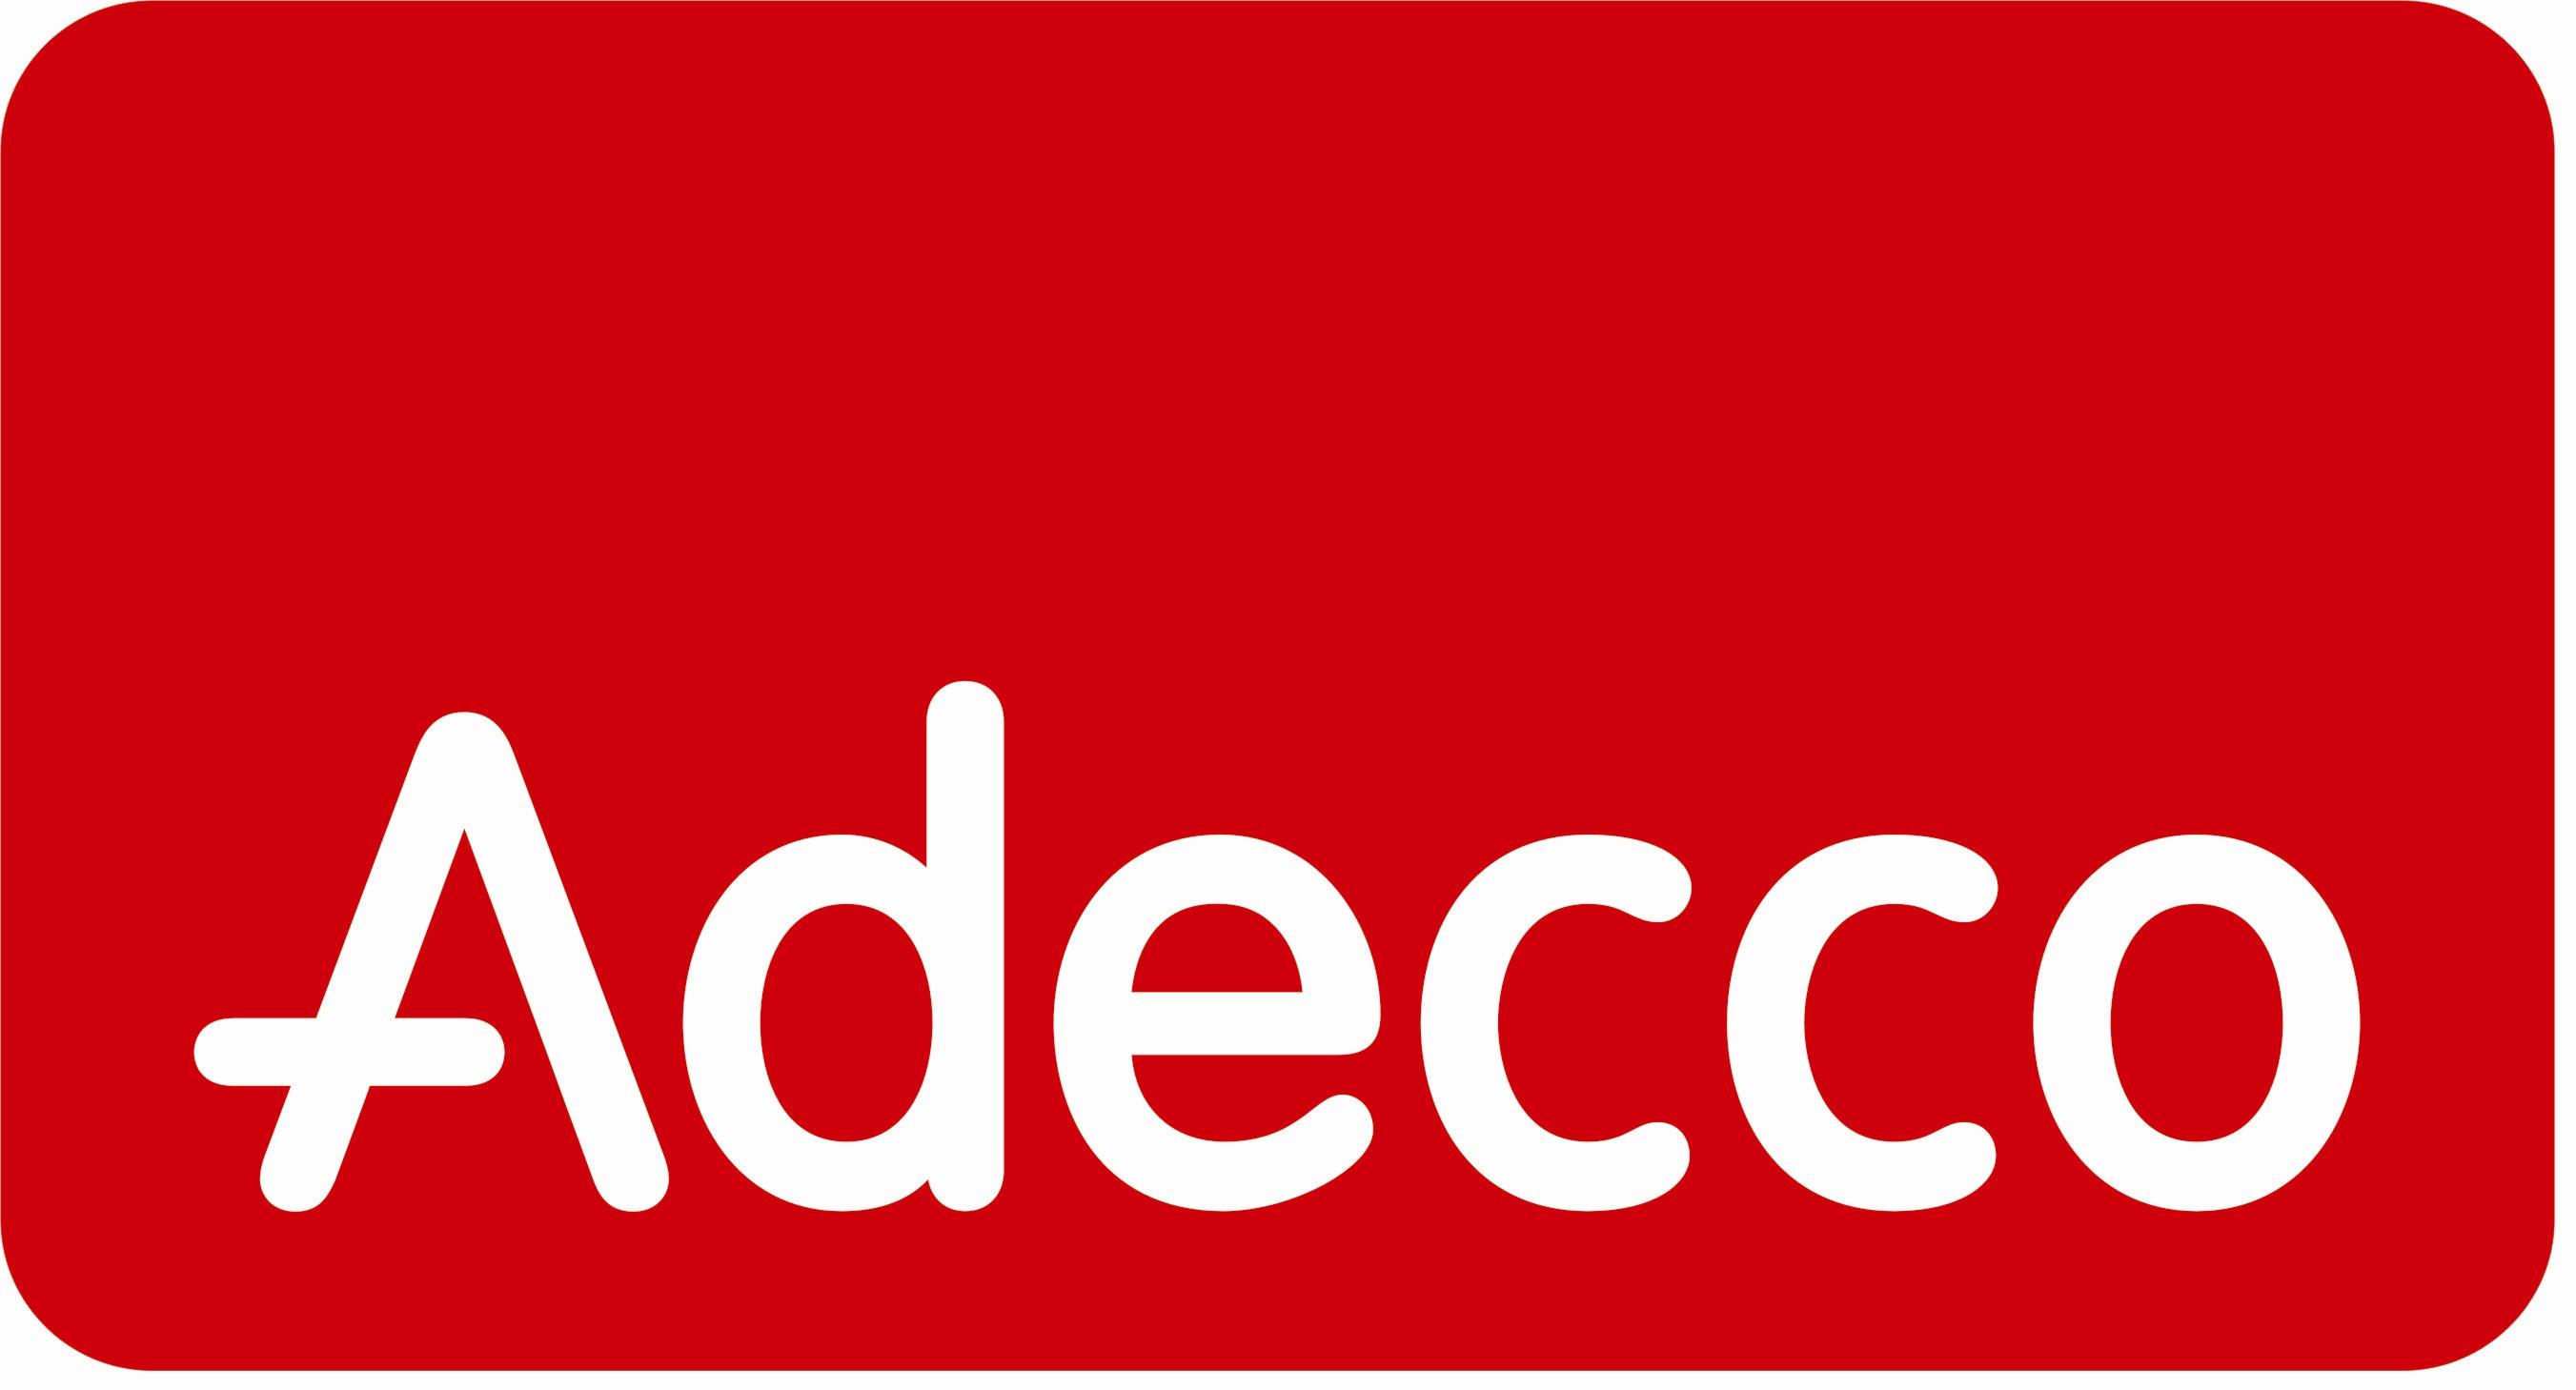 Adecco India Pvt Ltd Image